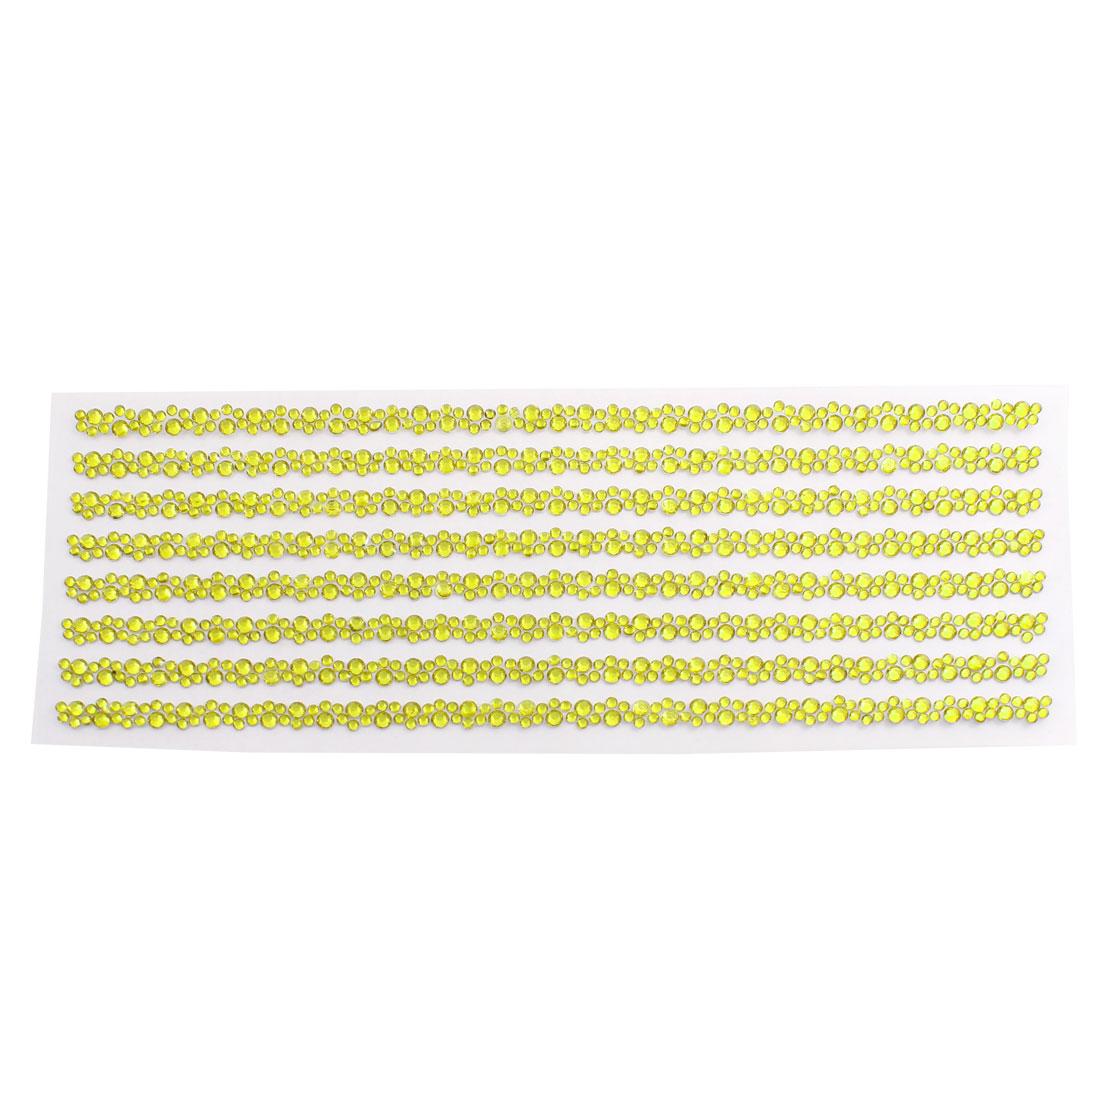 Gold Tone Self Adhesive Crystal Rhinestone Car Decorating DIY Stickers 255mm x 90mm